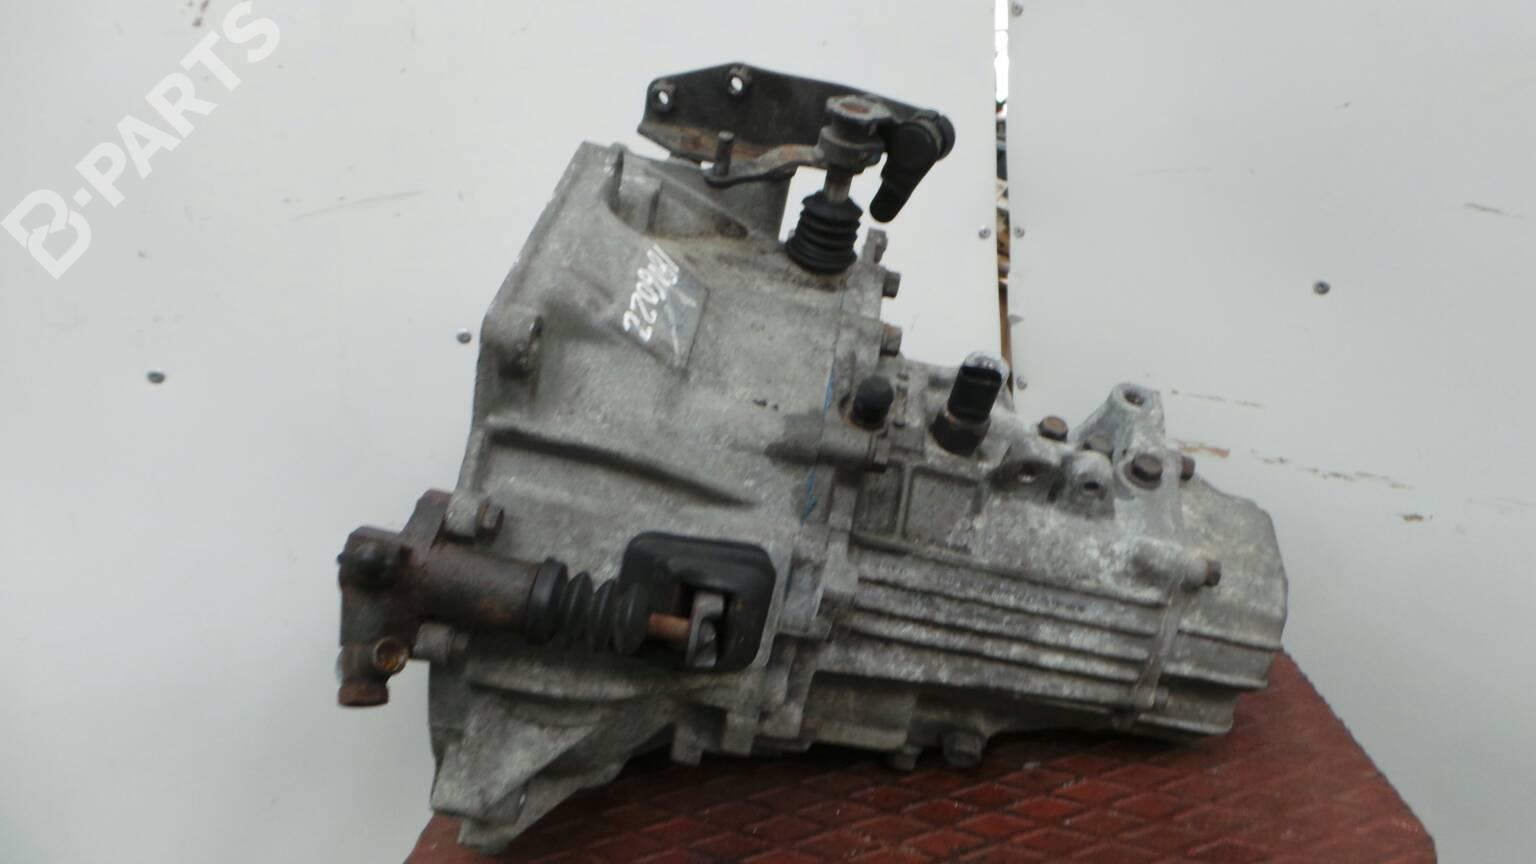 hight resolution of manual gearbox hx2073 135018 hyundai accent ii lc 1 3 5 doors